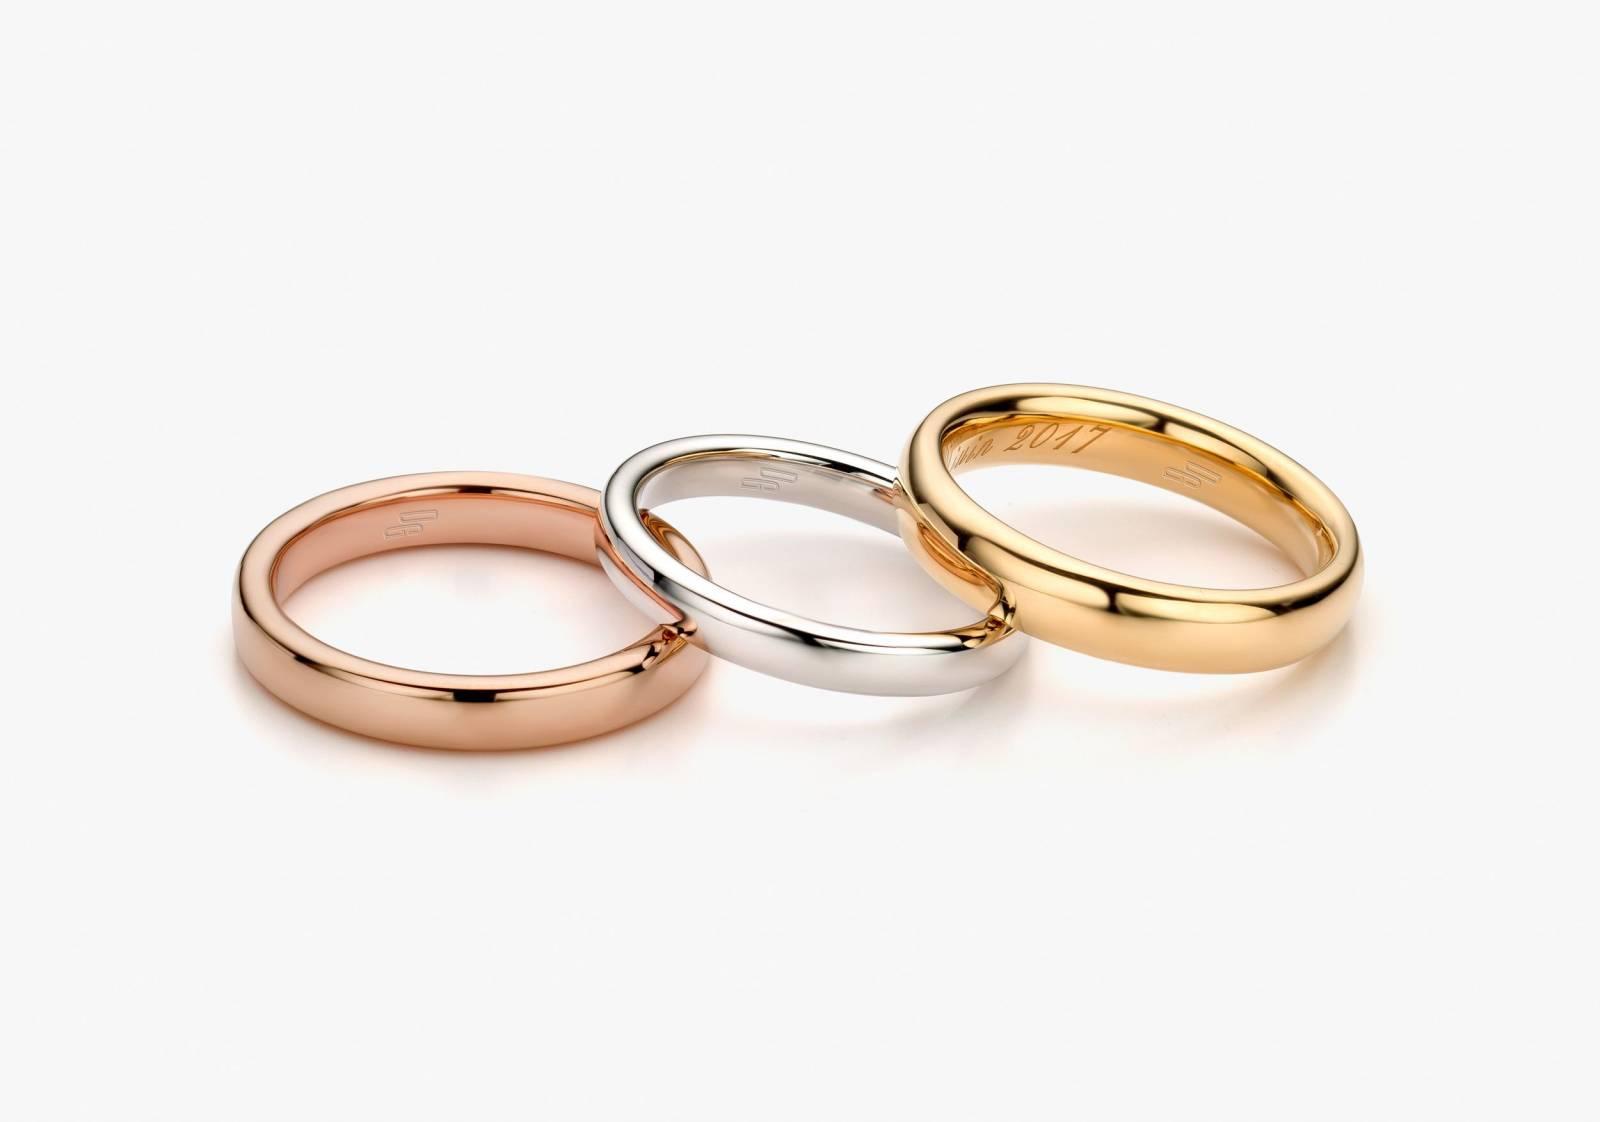 Maison De Greef - Juwelen - Brussel - Bruidsjuwelen - Trouwring - Verlovingsring - House of Weddings - 1